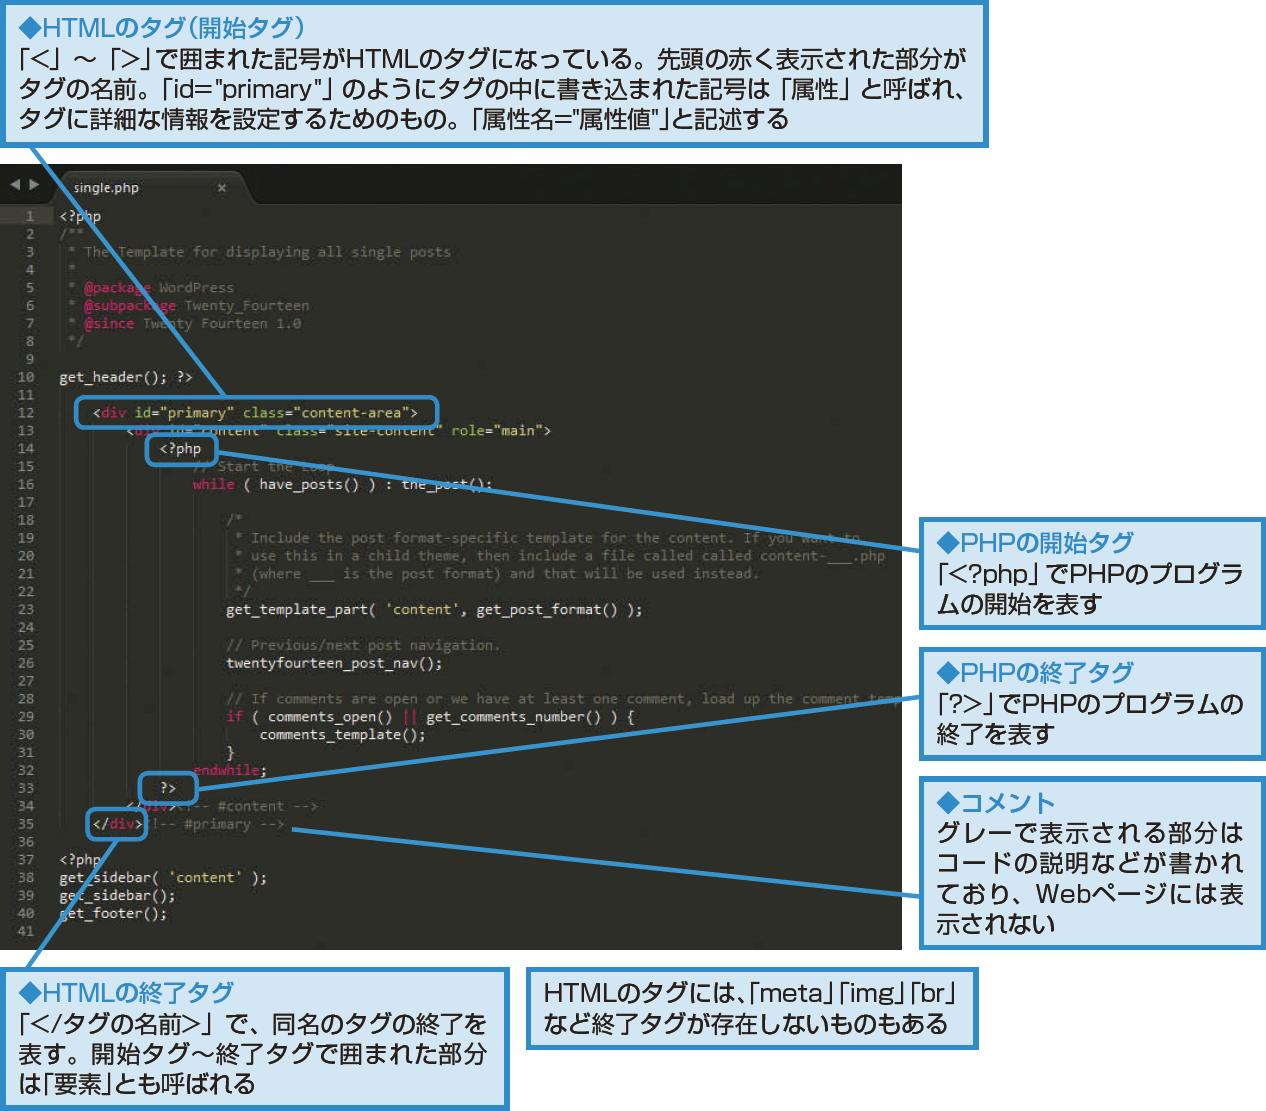 HTMLとPHPのコード